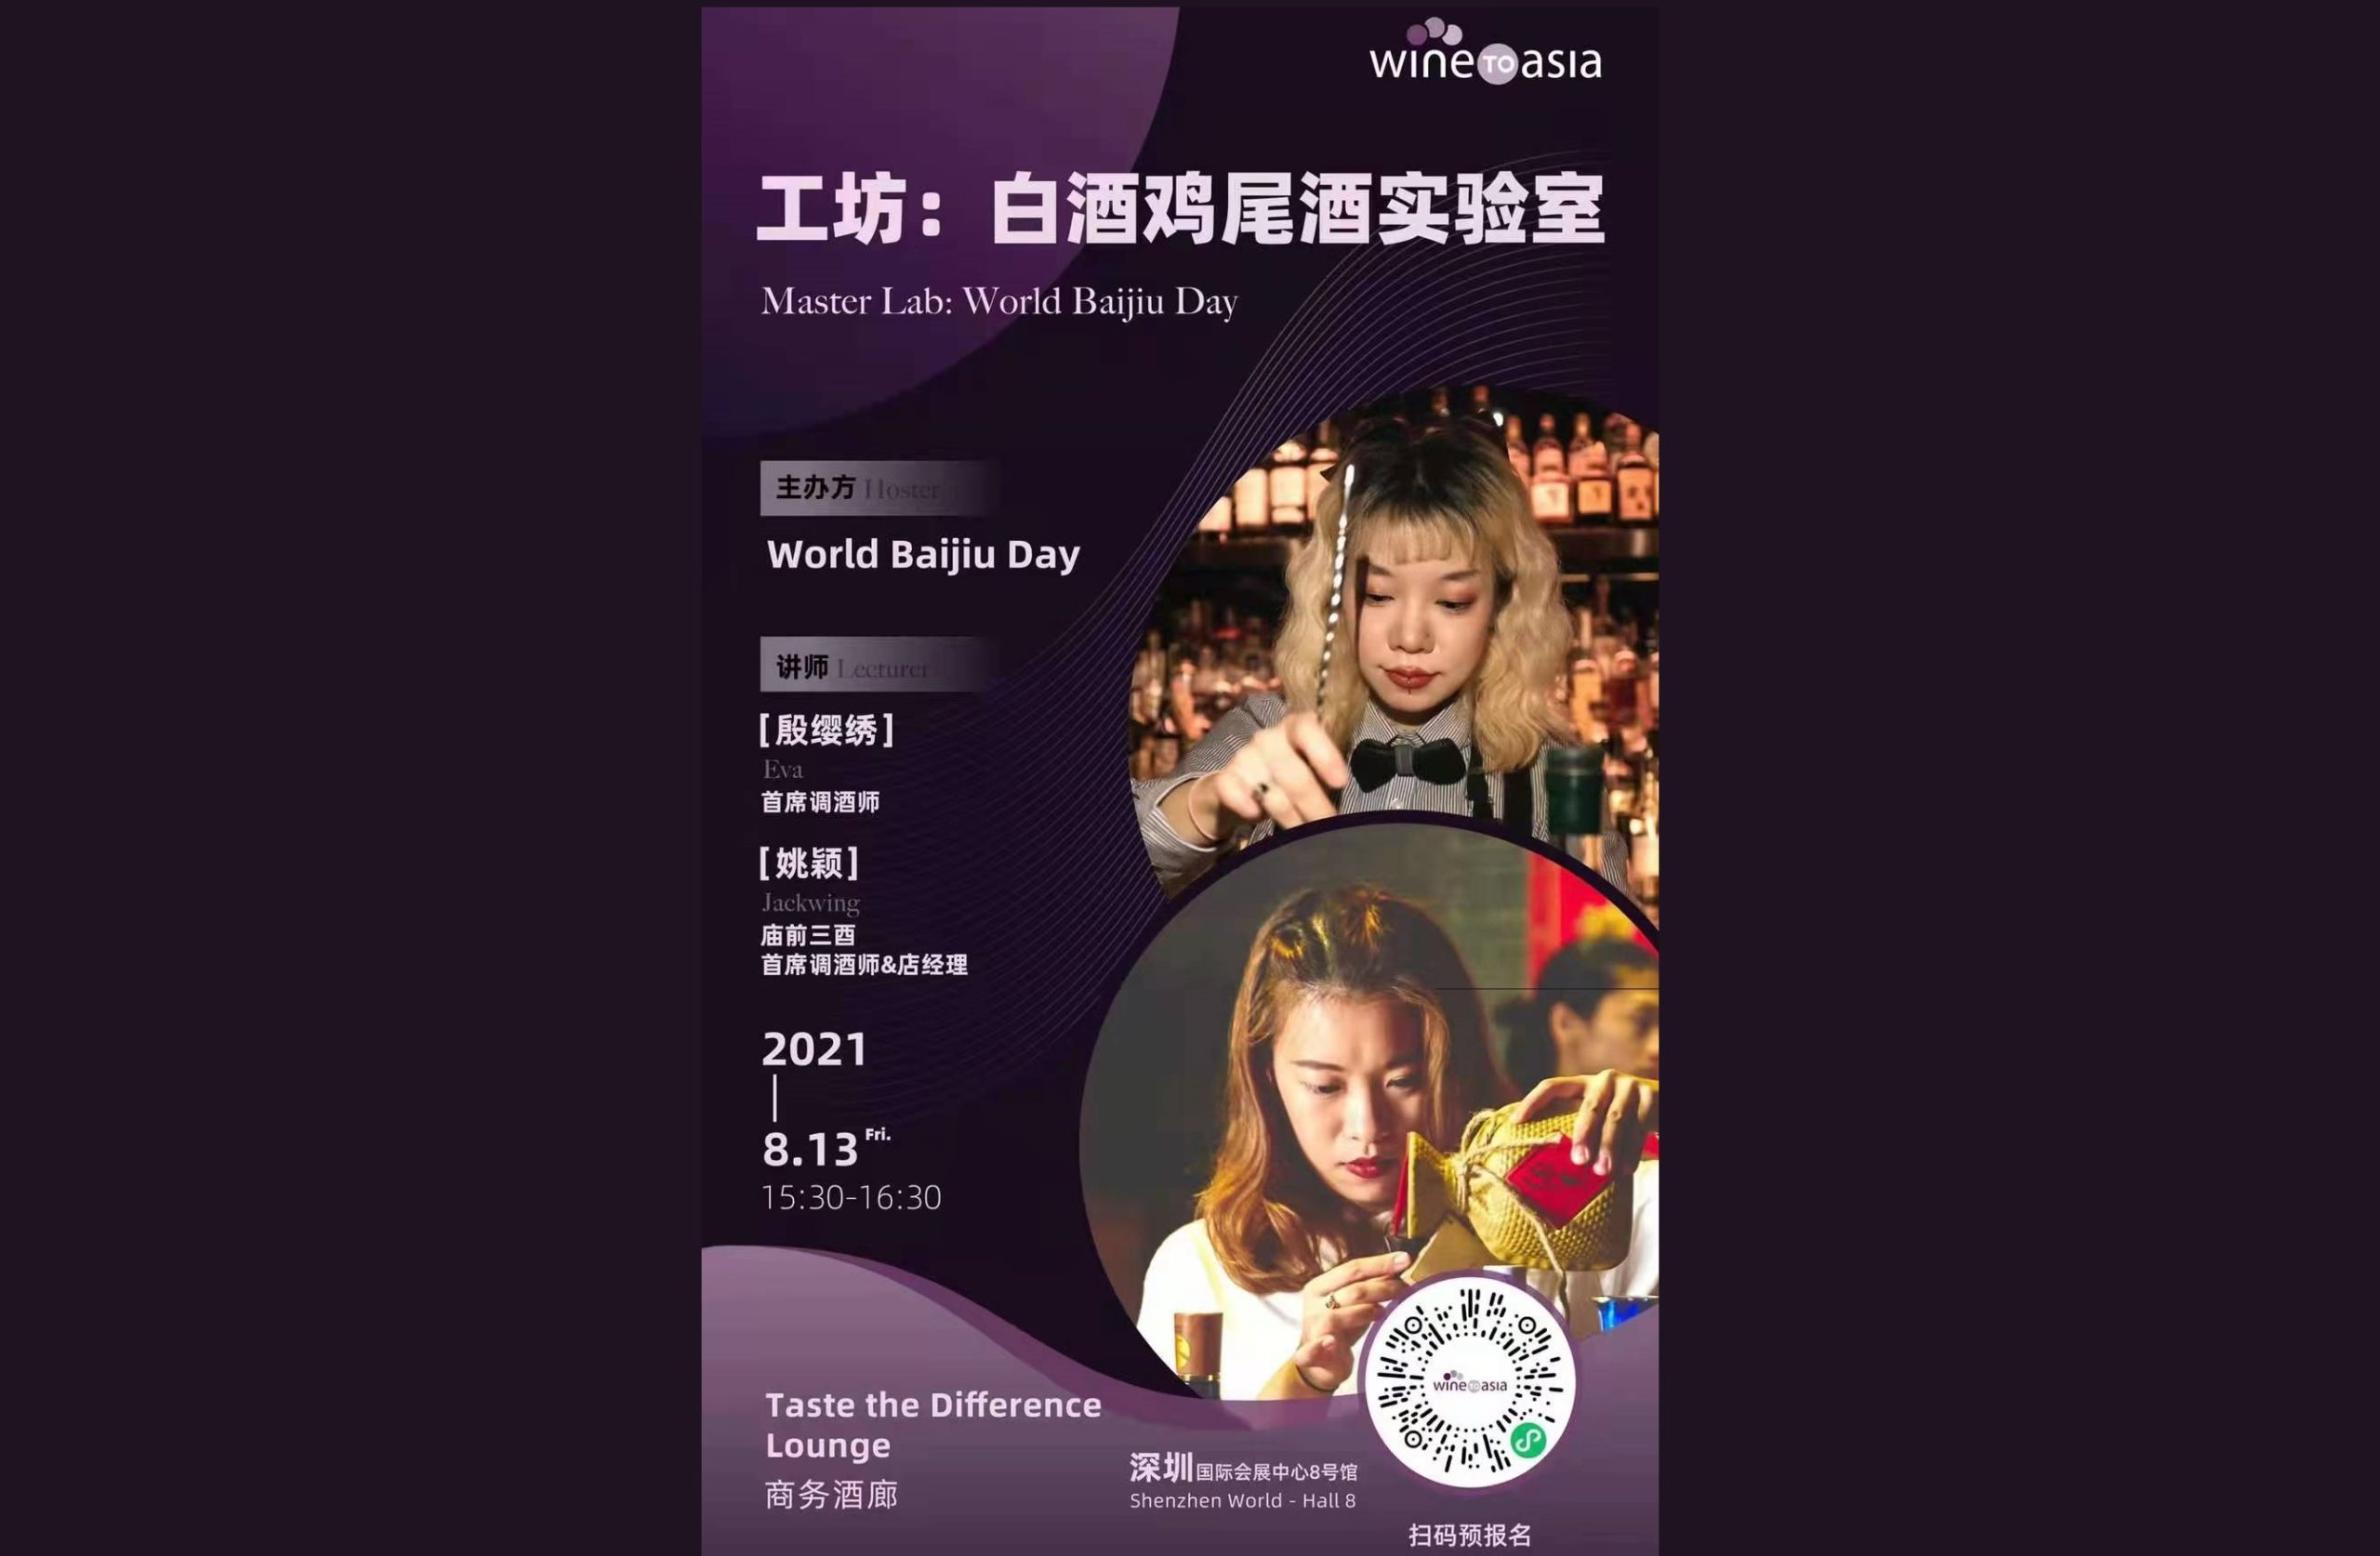 world baijiu day wine to asia baijiu cocktail class compass bar sanyou 2